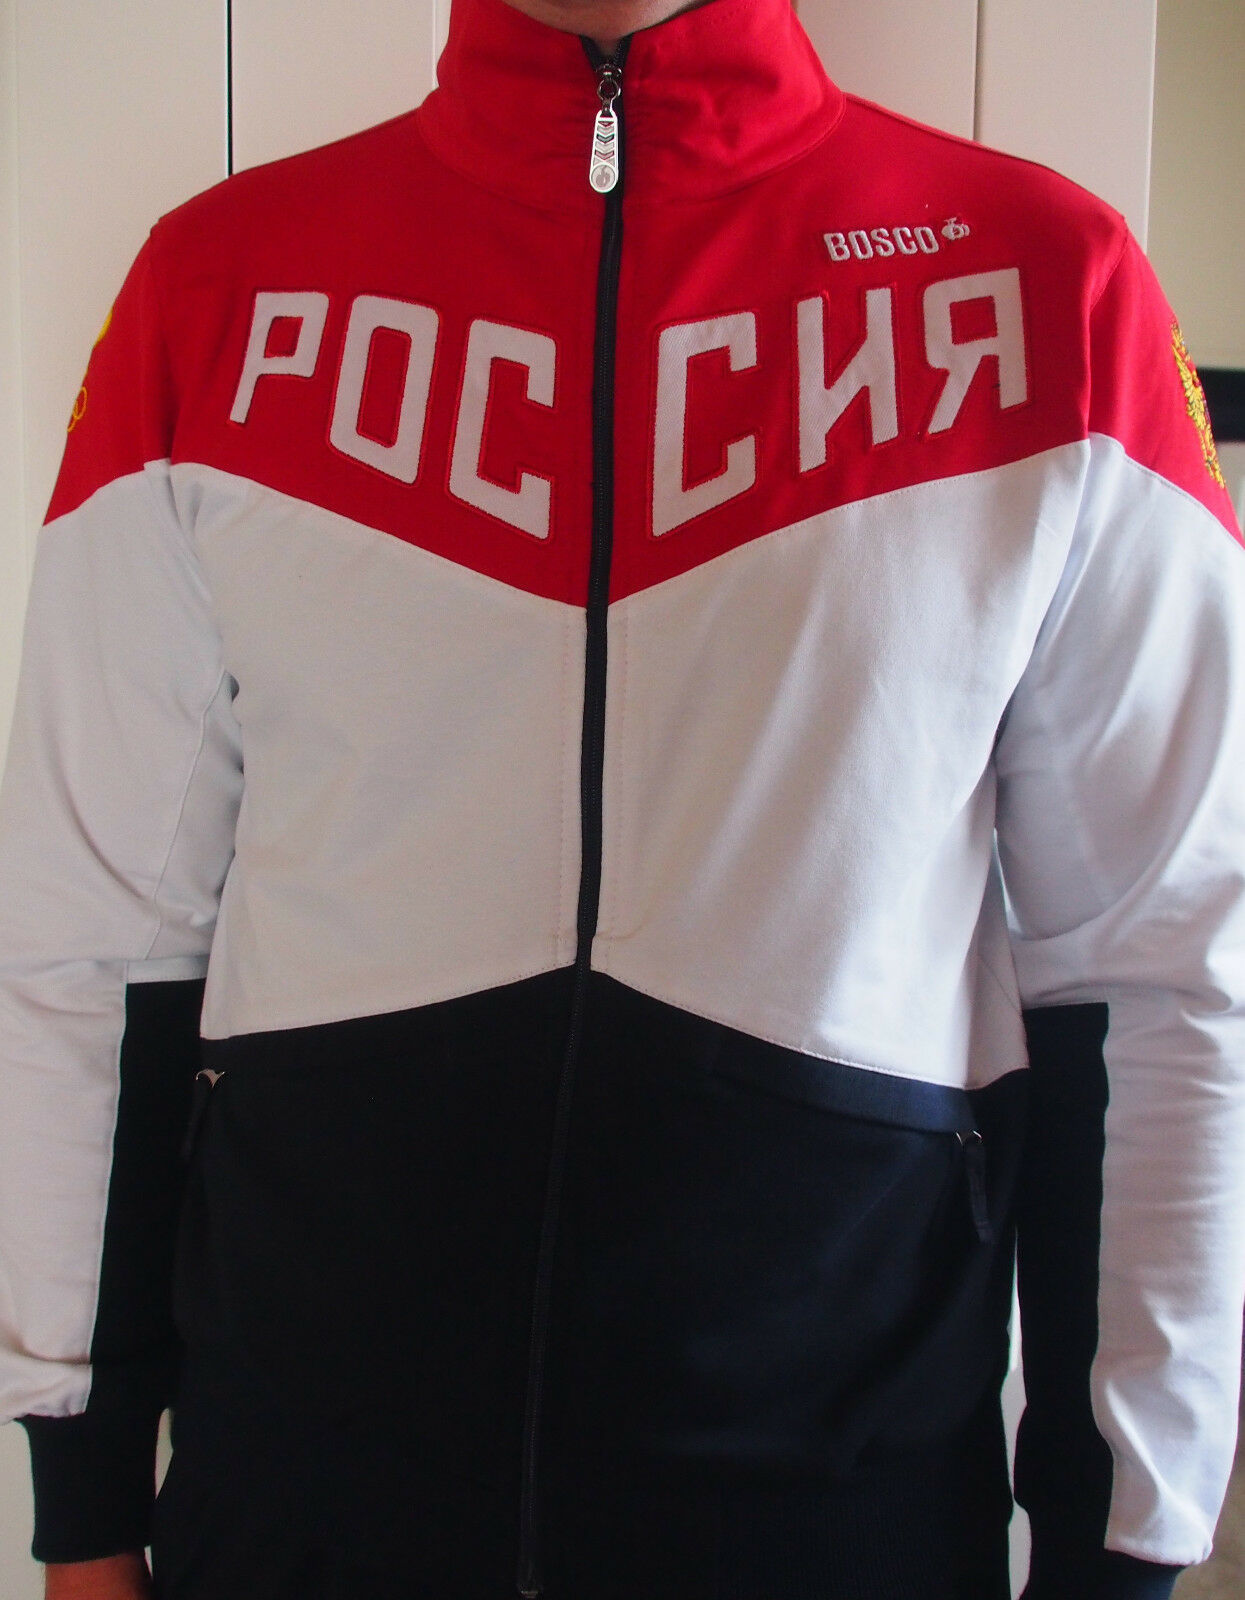 d457a6a6c3a67 RIO 2016 Brazil Bosco Sport Russia Olympic games uniform mens Lycra/Elastine  фото